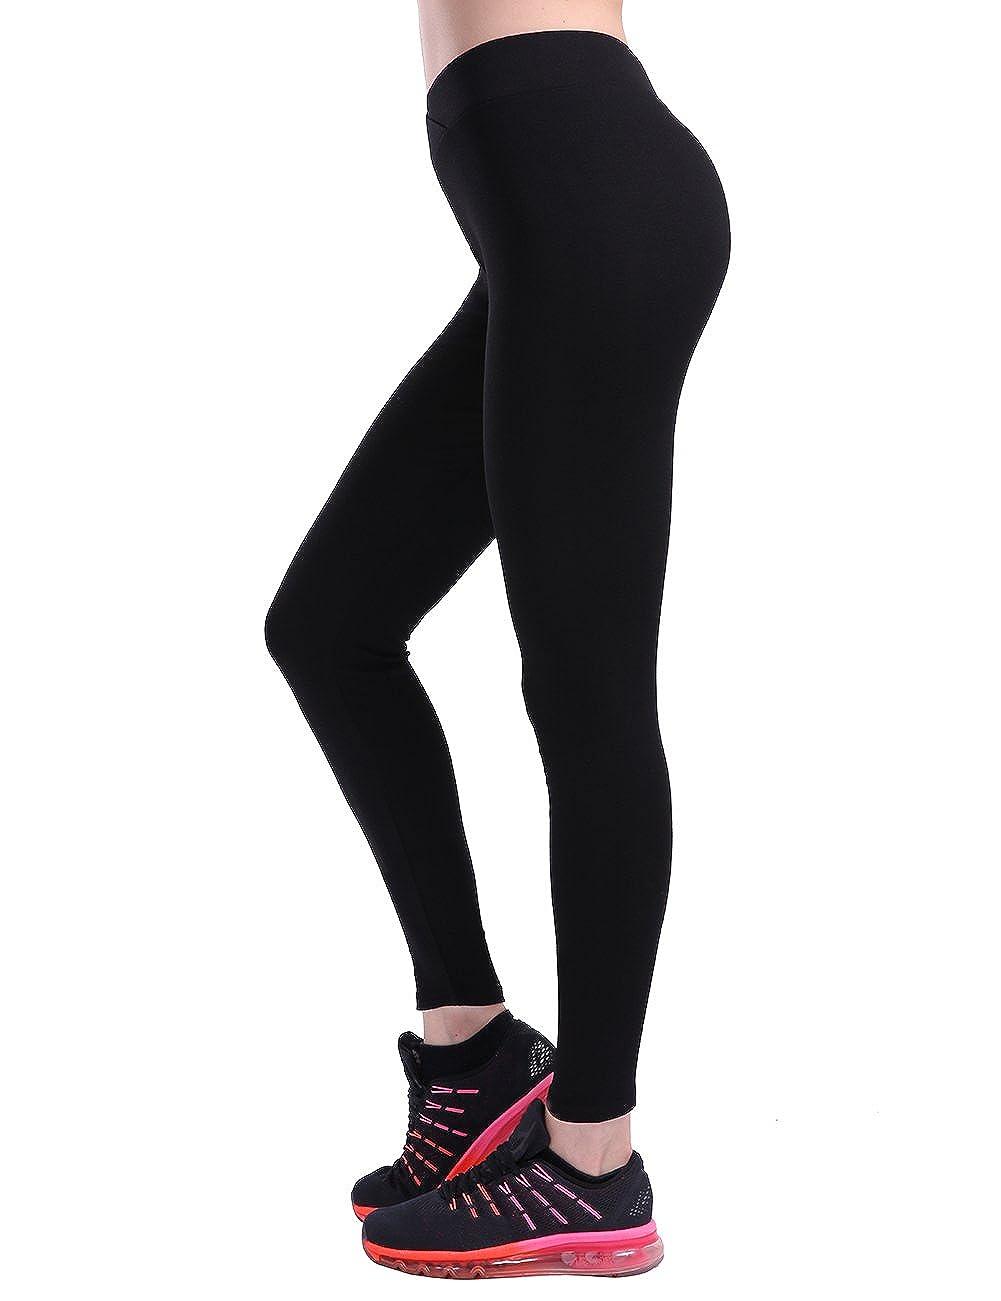 CHRLEISURE Scrunch Butt Leggings for Women Push Up High Waisted V Waist Casual Yoga Pants